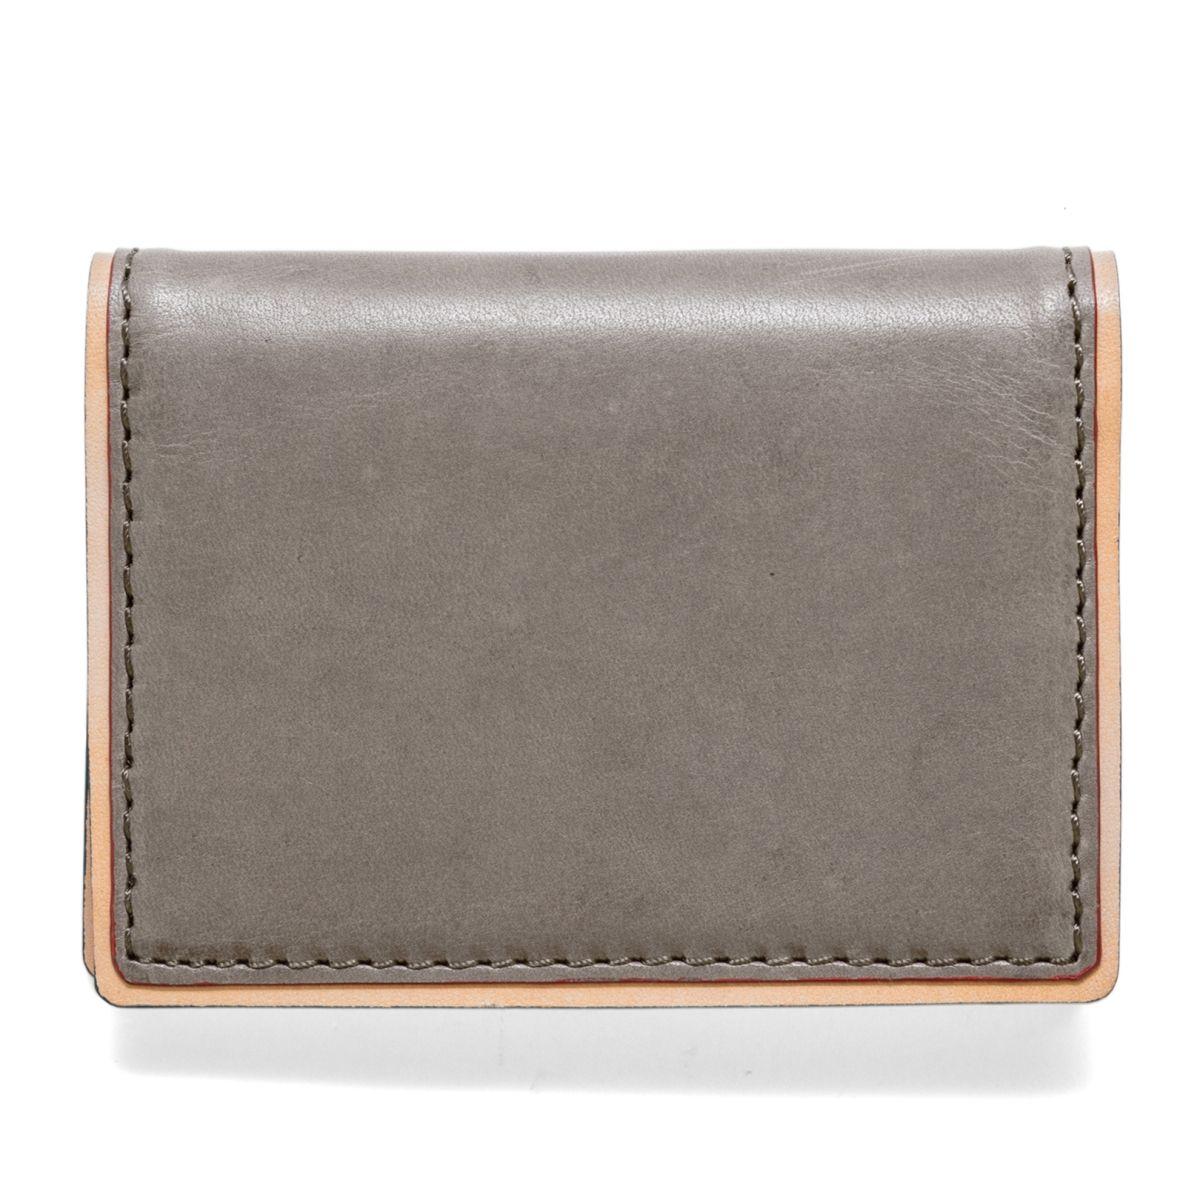 J.FOLD ארנק עור דגם Duotone Folding - אפור